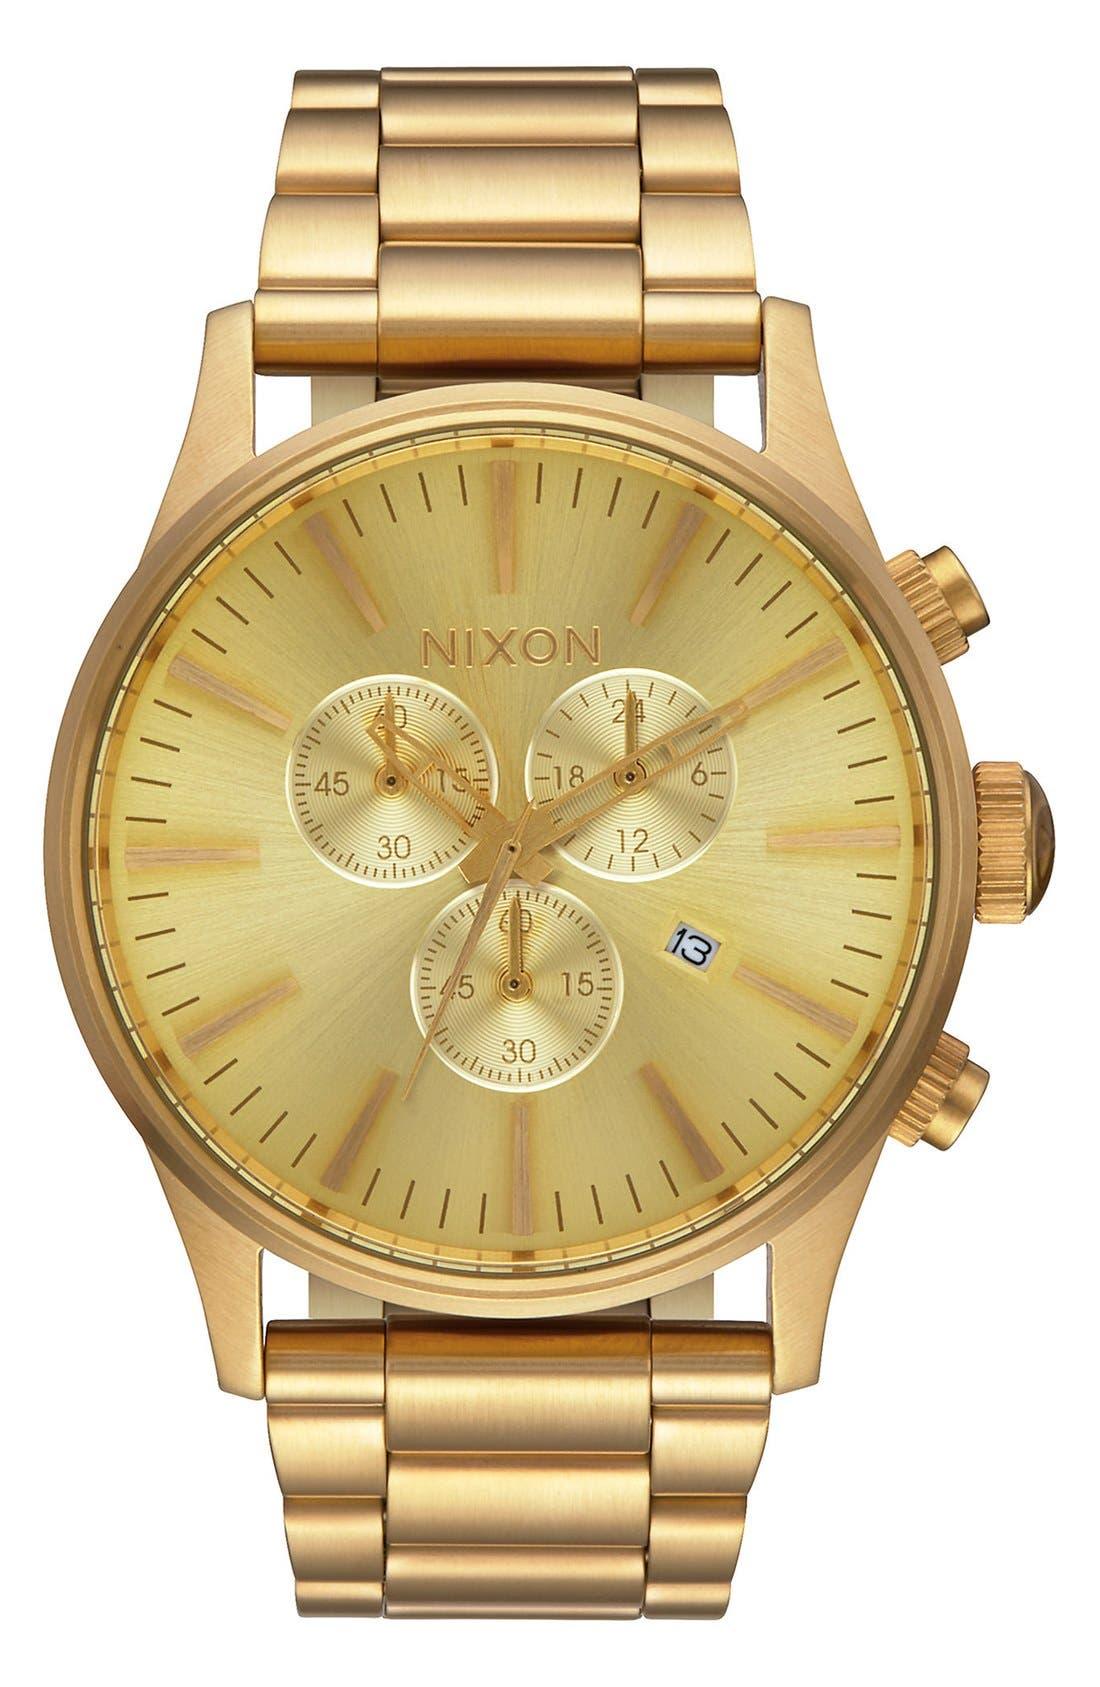 Main Image - Nixon 'The Sentry' Chronograph Bracelet Watch, 42mm